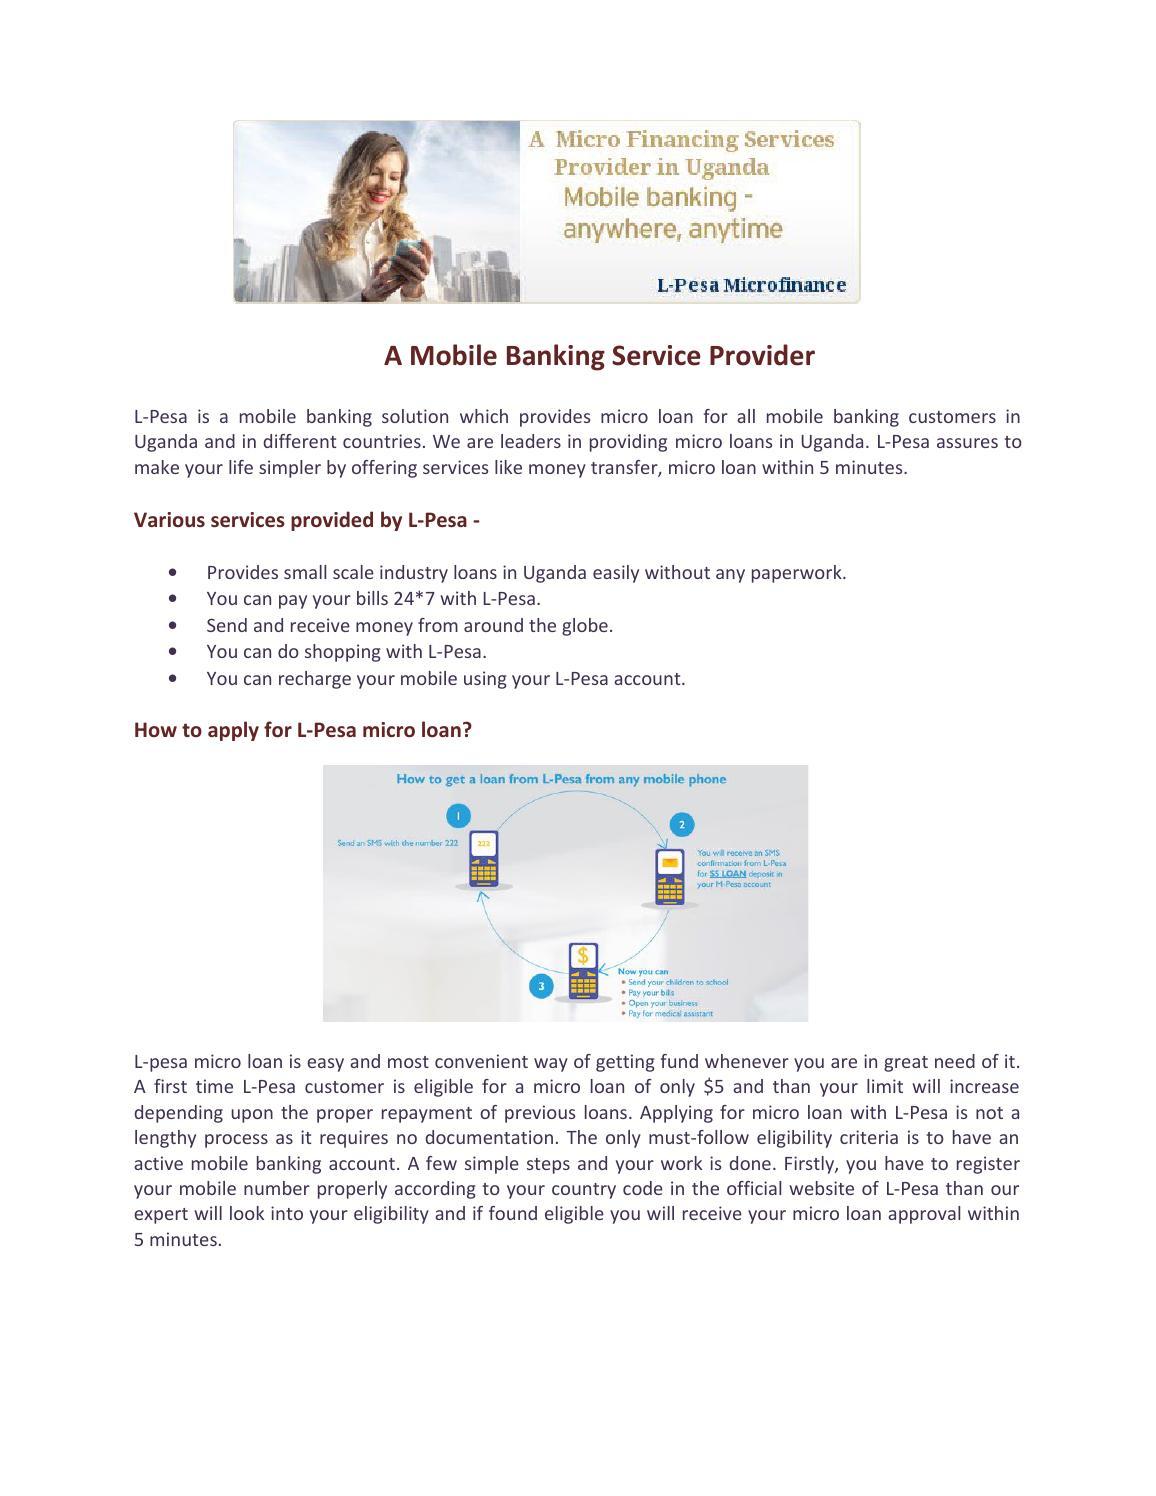 L-Pesa Microfinance - An Online Micro loan service provider